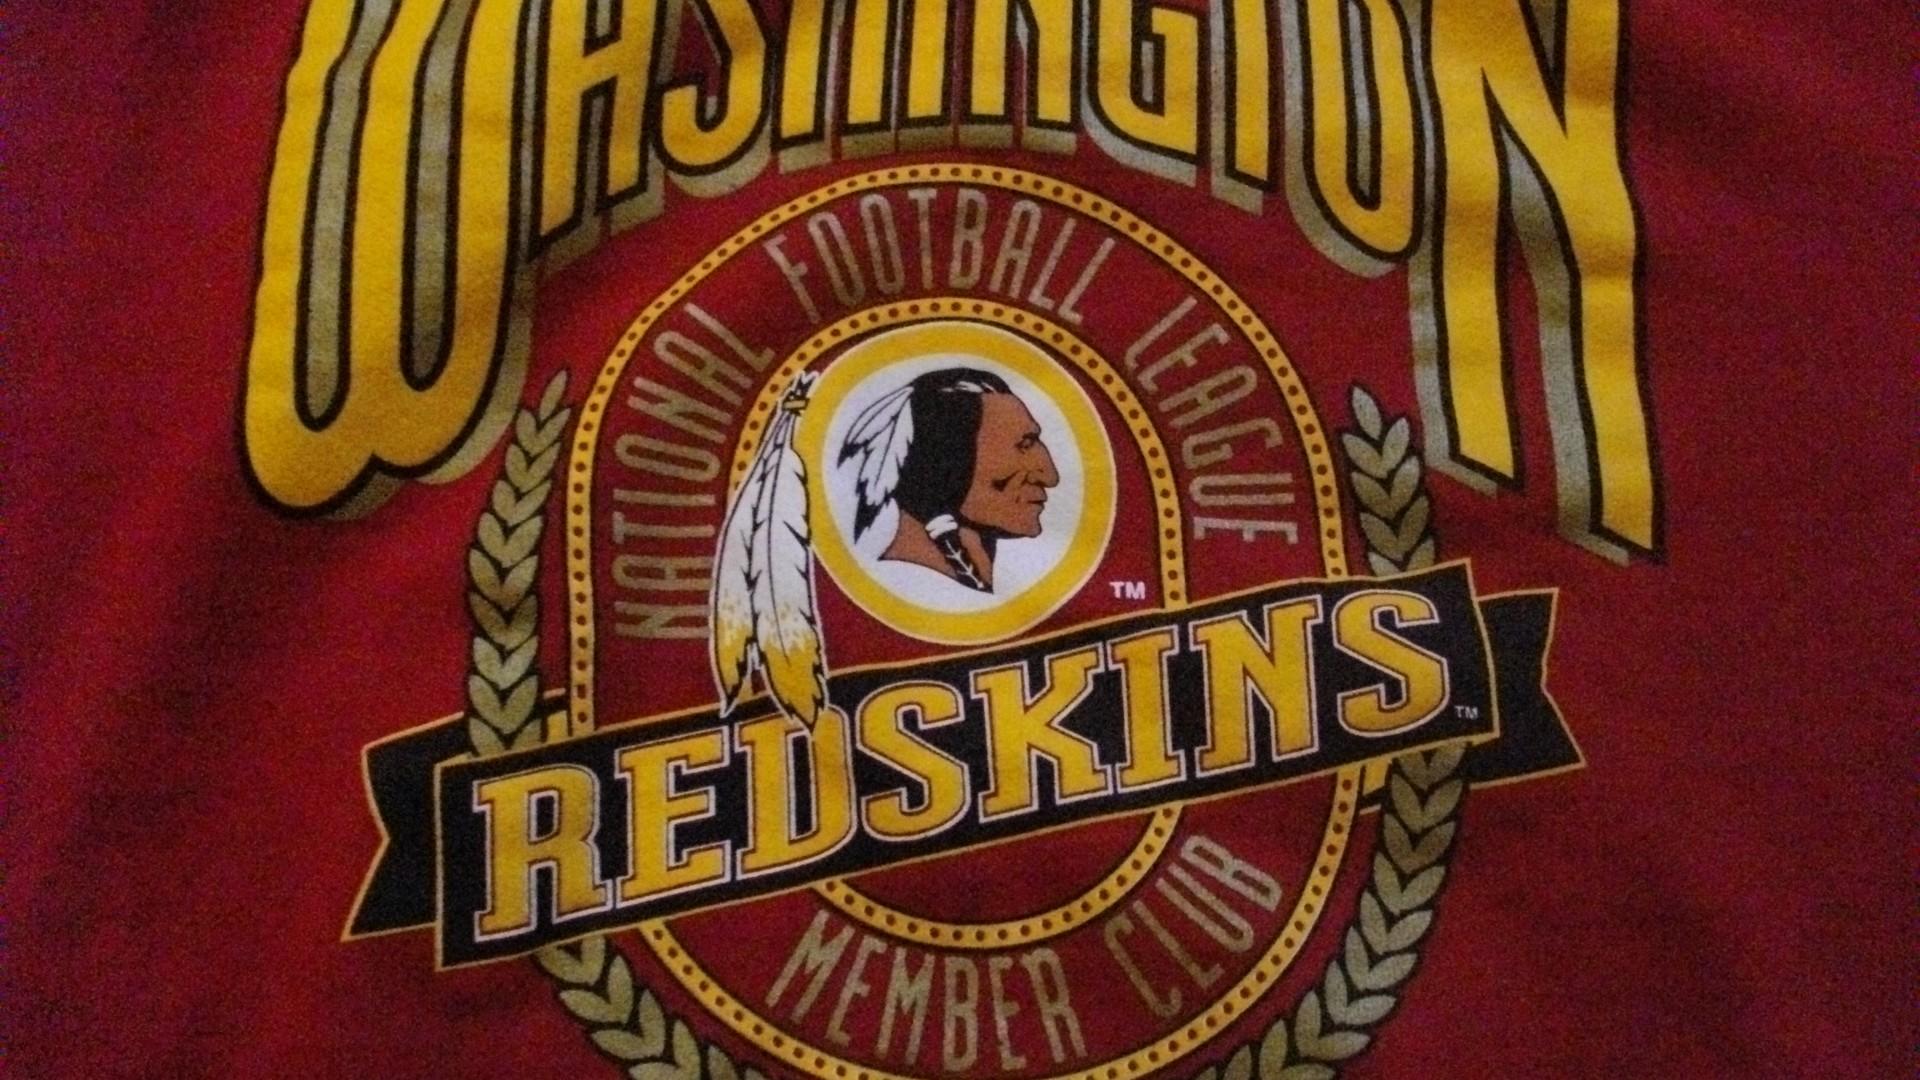 Washington Redskins Wallpaper For Mac Backgrounds 2020 NFL 1920x1080